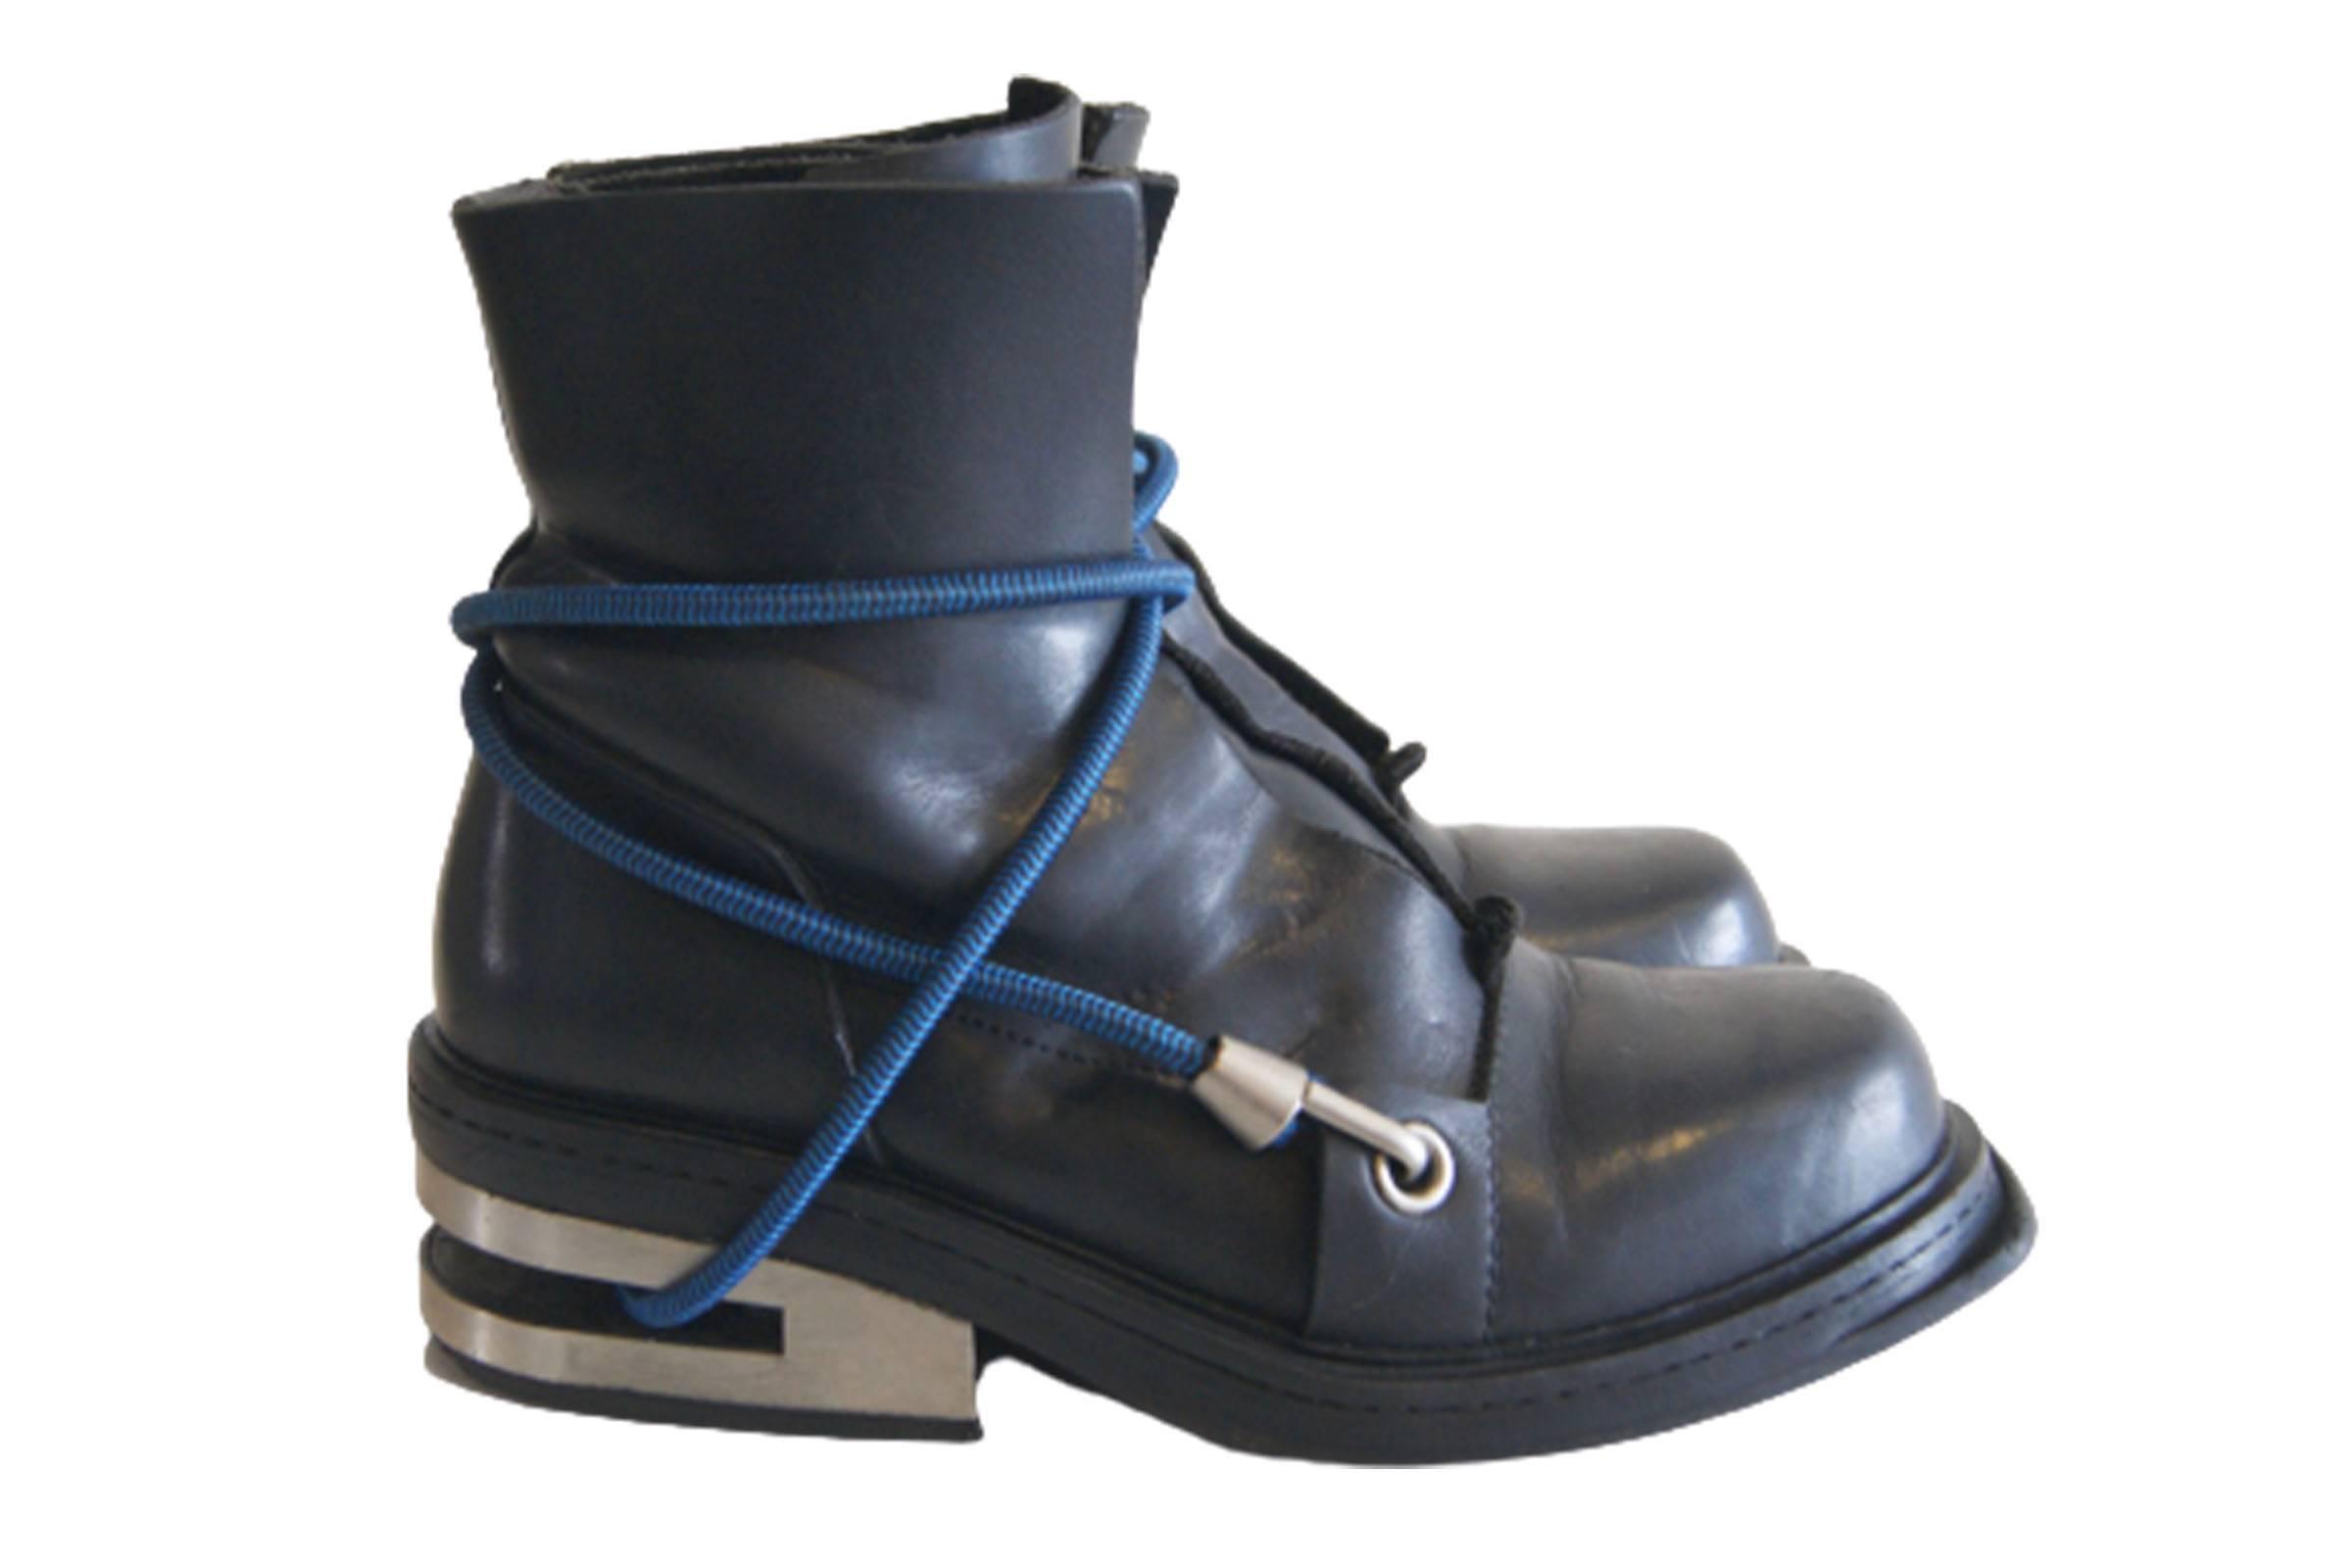 Dirk Bikkembergs Bungee Boots